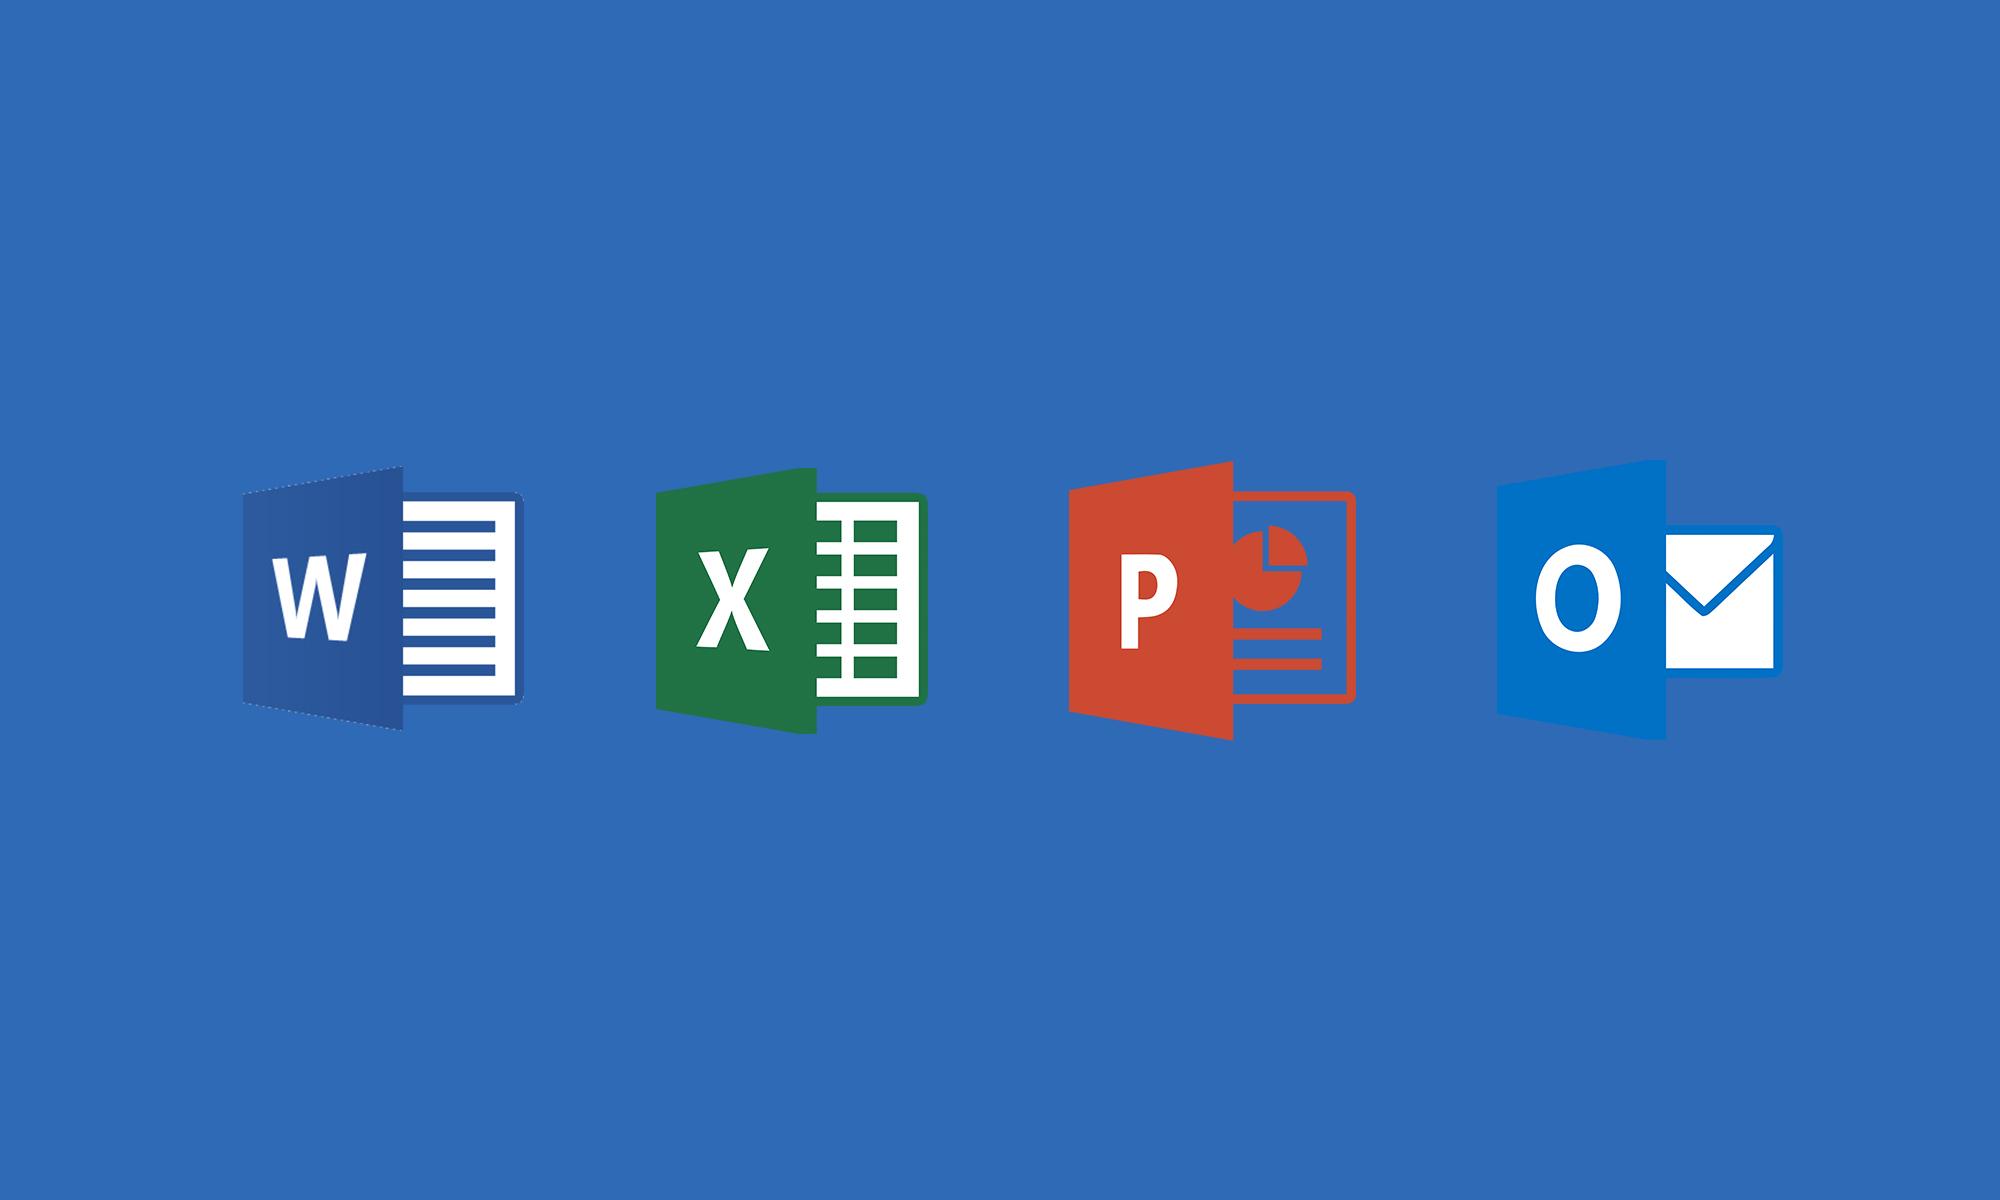 Program Office 365